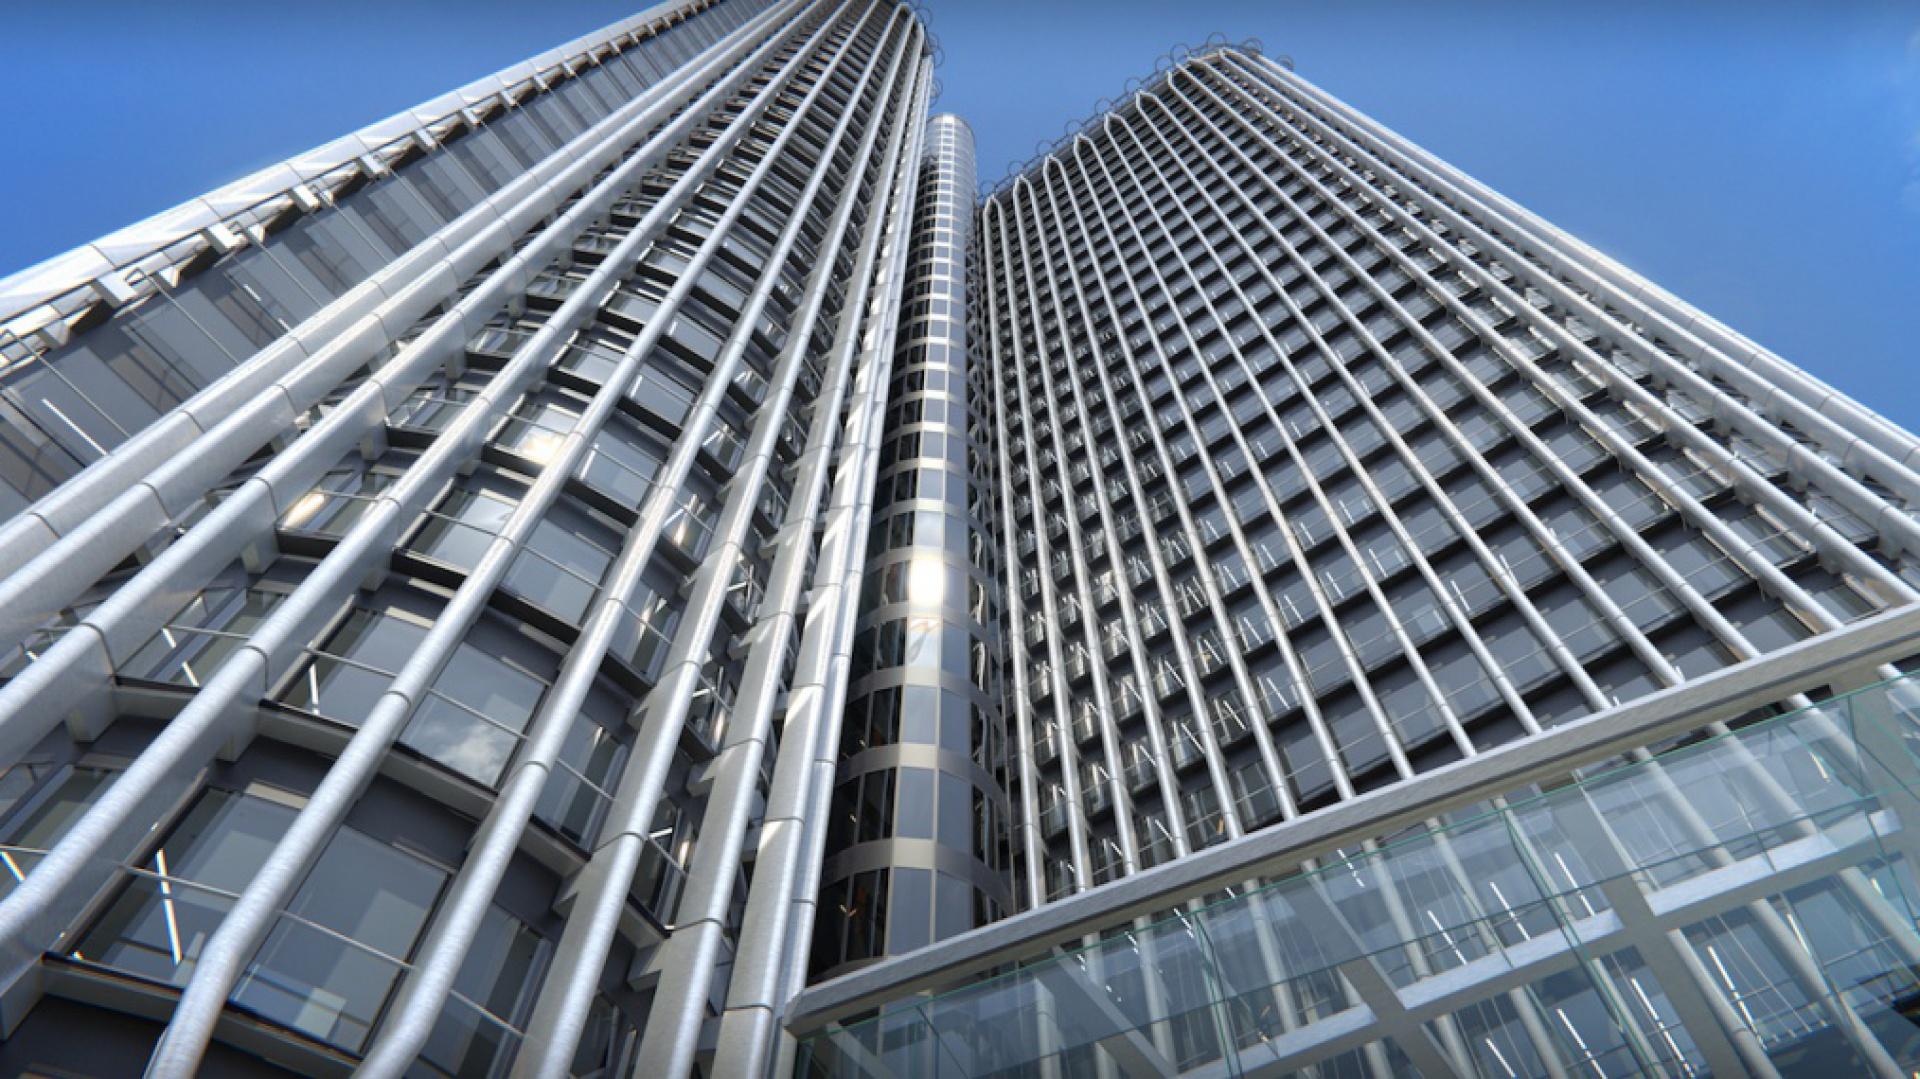 Torre Europa fot. materiały prasowe Philips Lighting